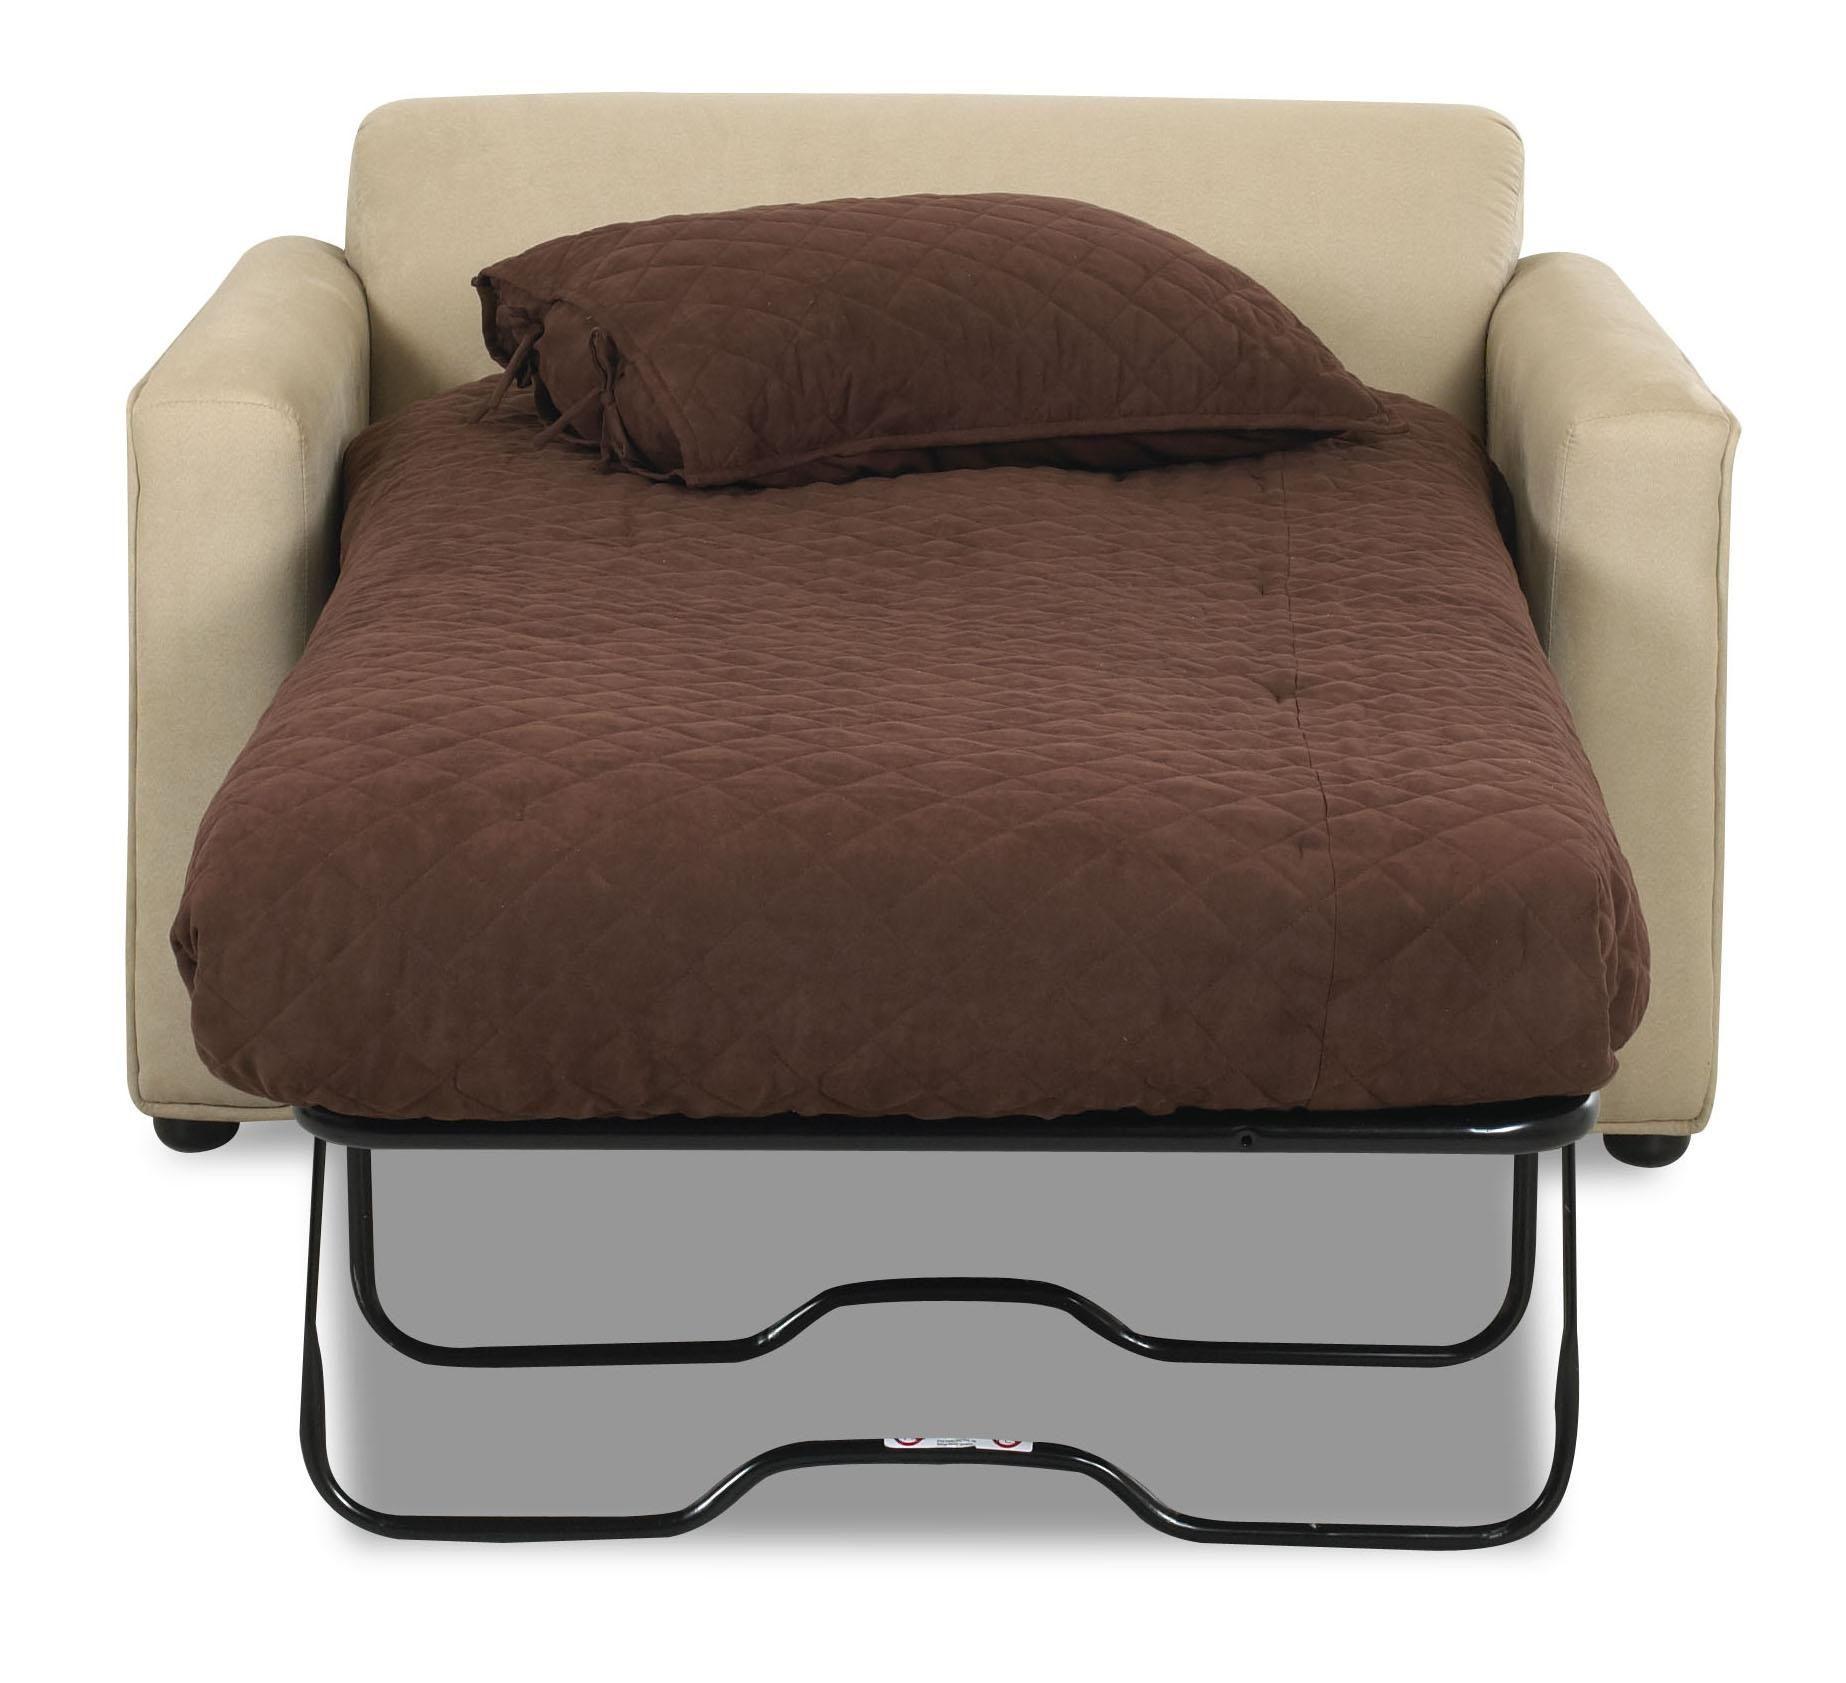 Sketch Of Twin Size Sleeper Sofa Furniture Foam Bed